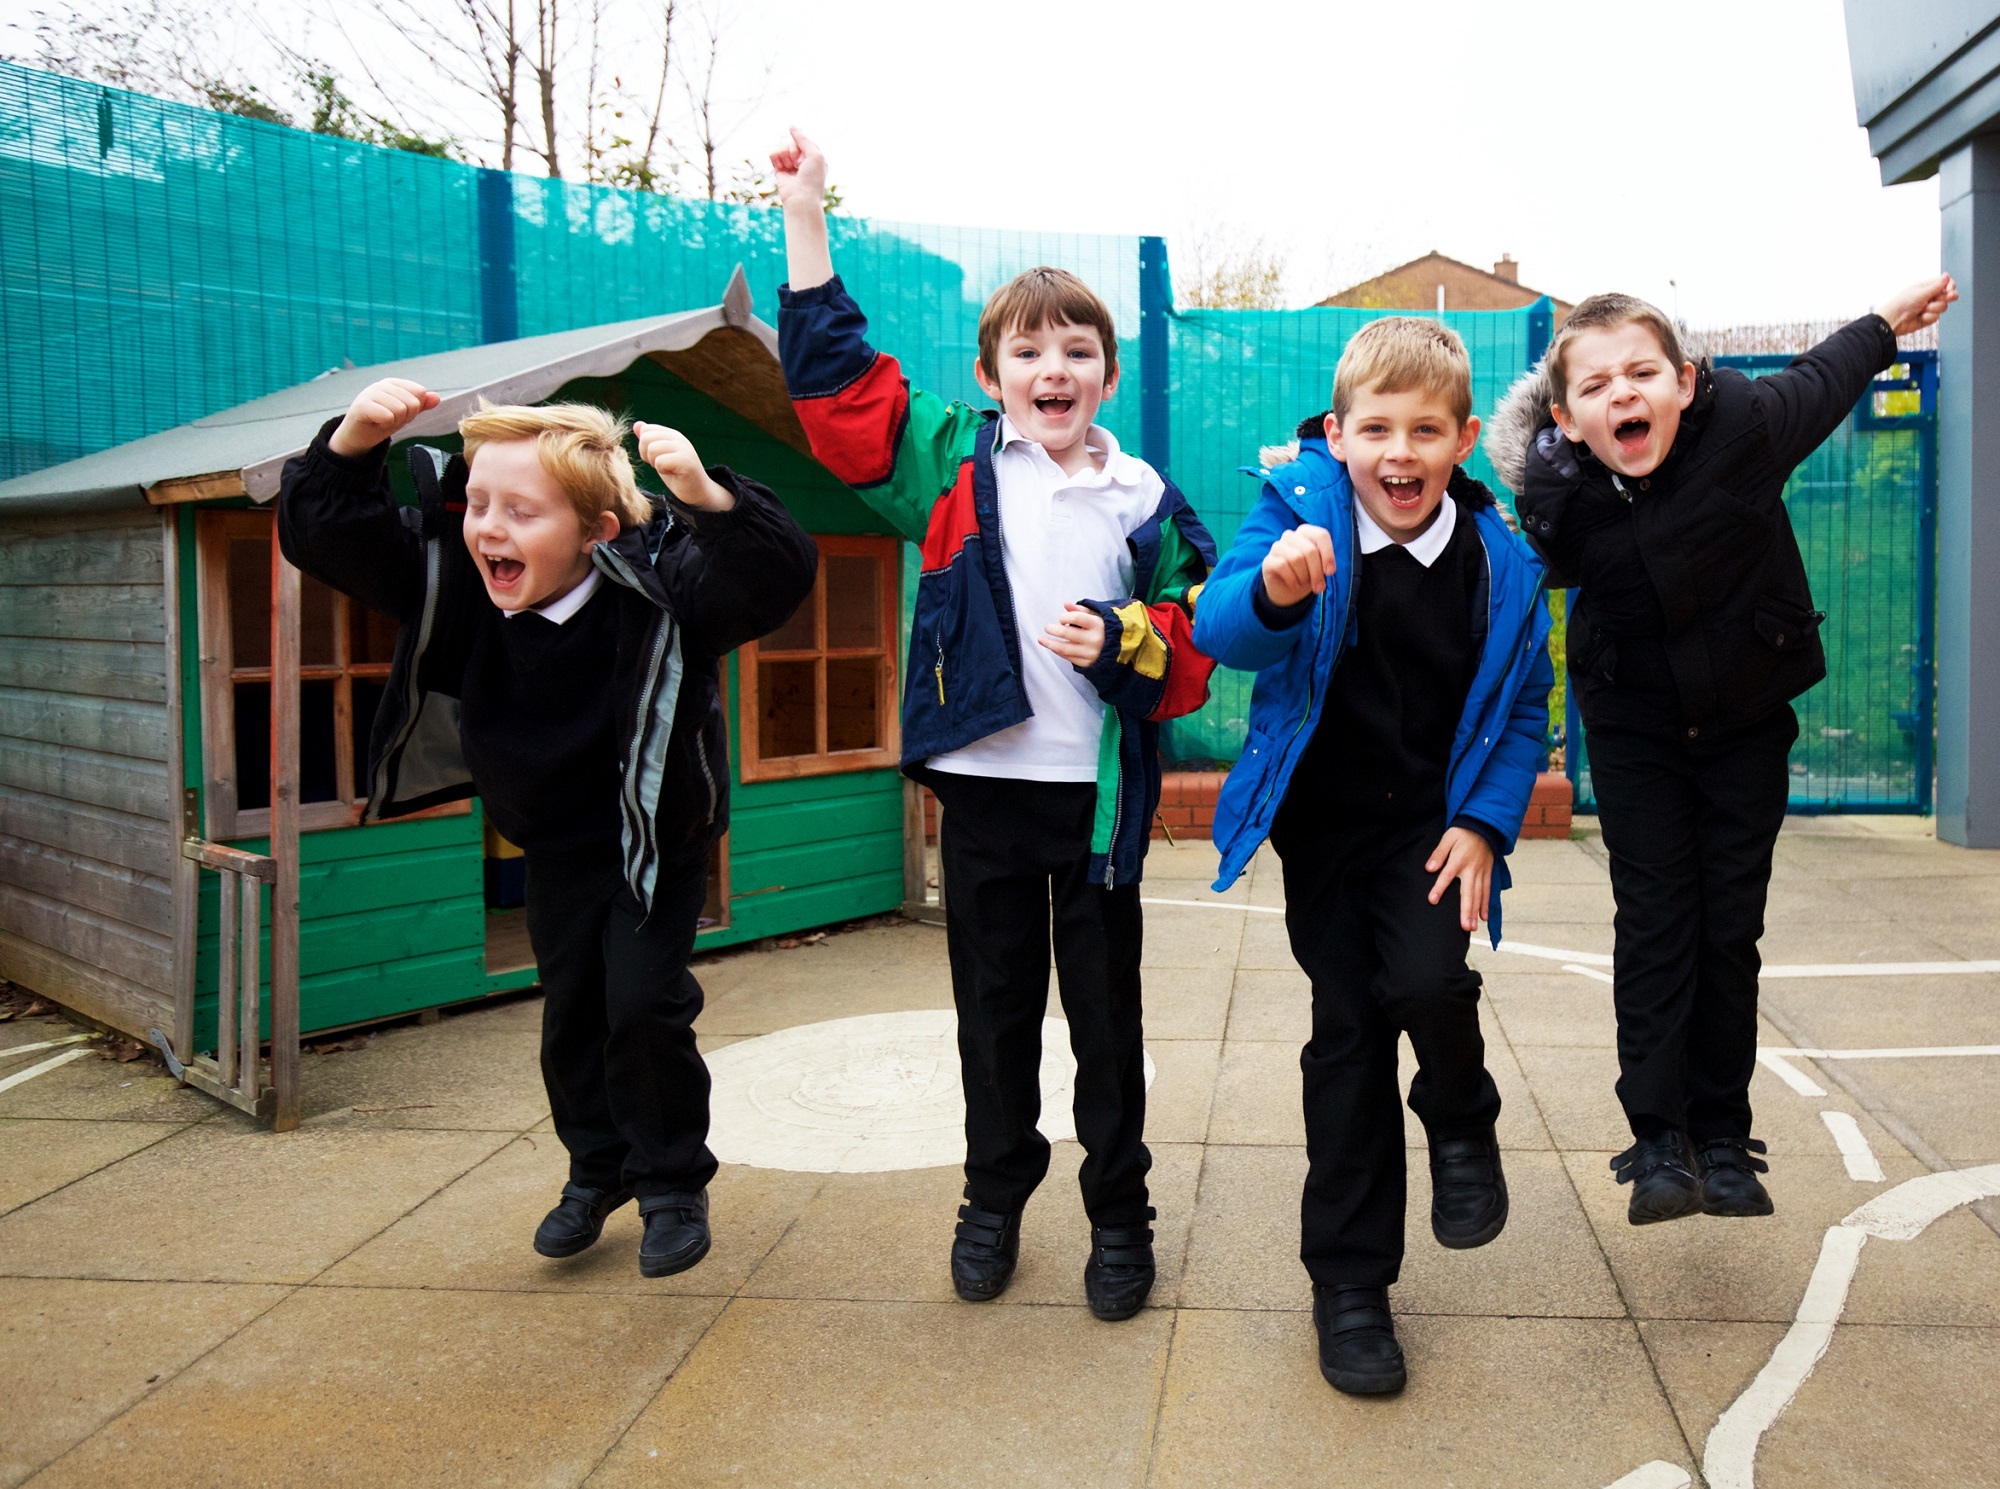 Local school celebrates Autism Accreditation during World Autism